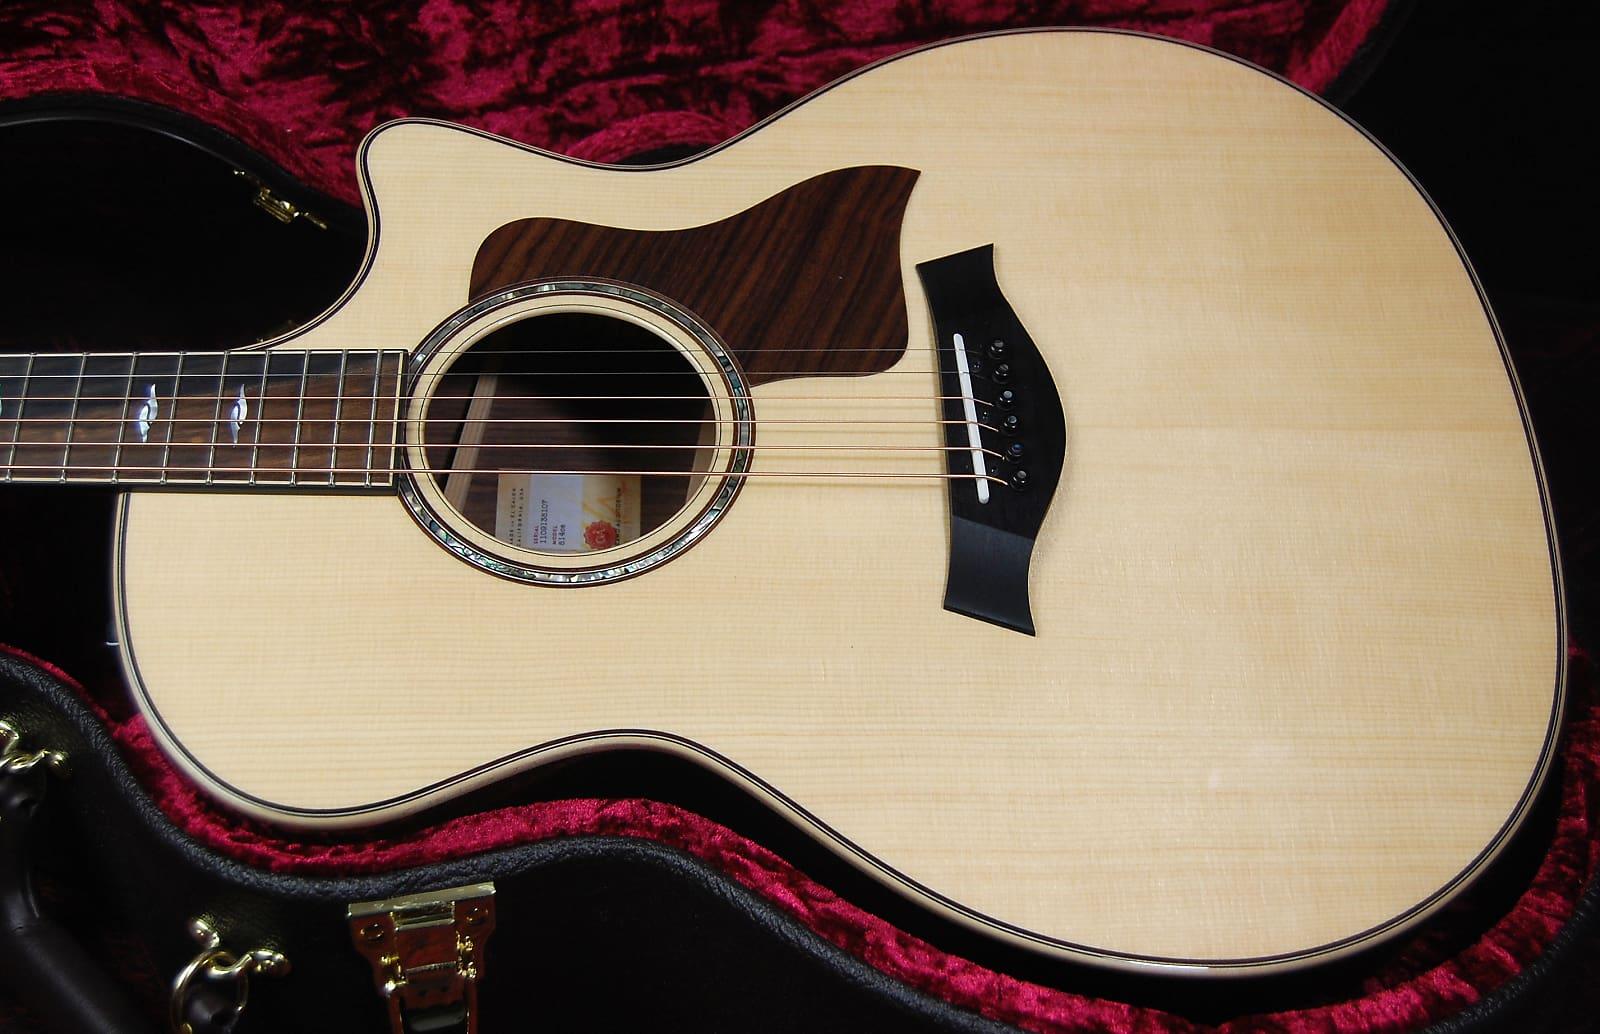 Acoustic Electric Guitars Taylor 814ce V-class Grand Auditorium Acoustic-electric Natural